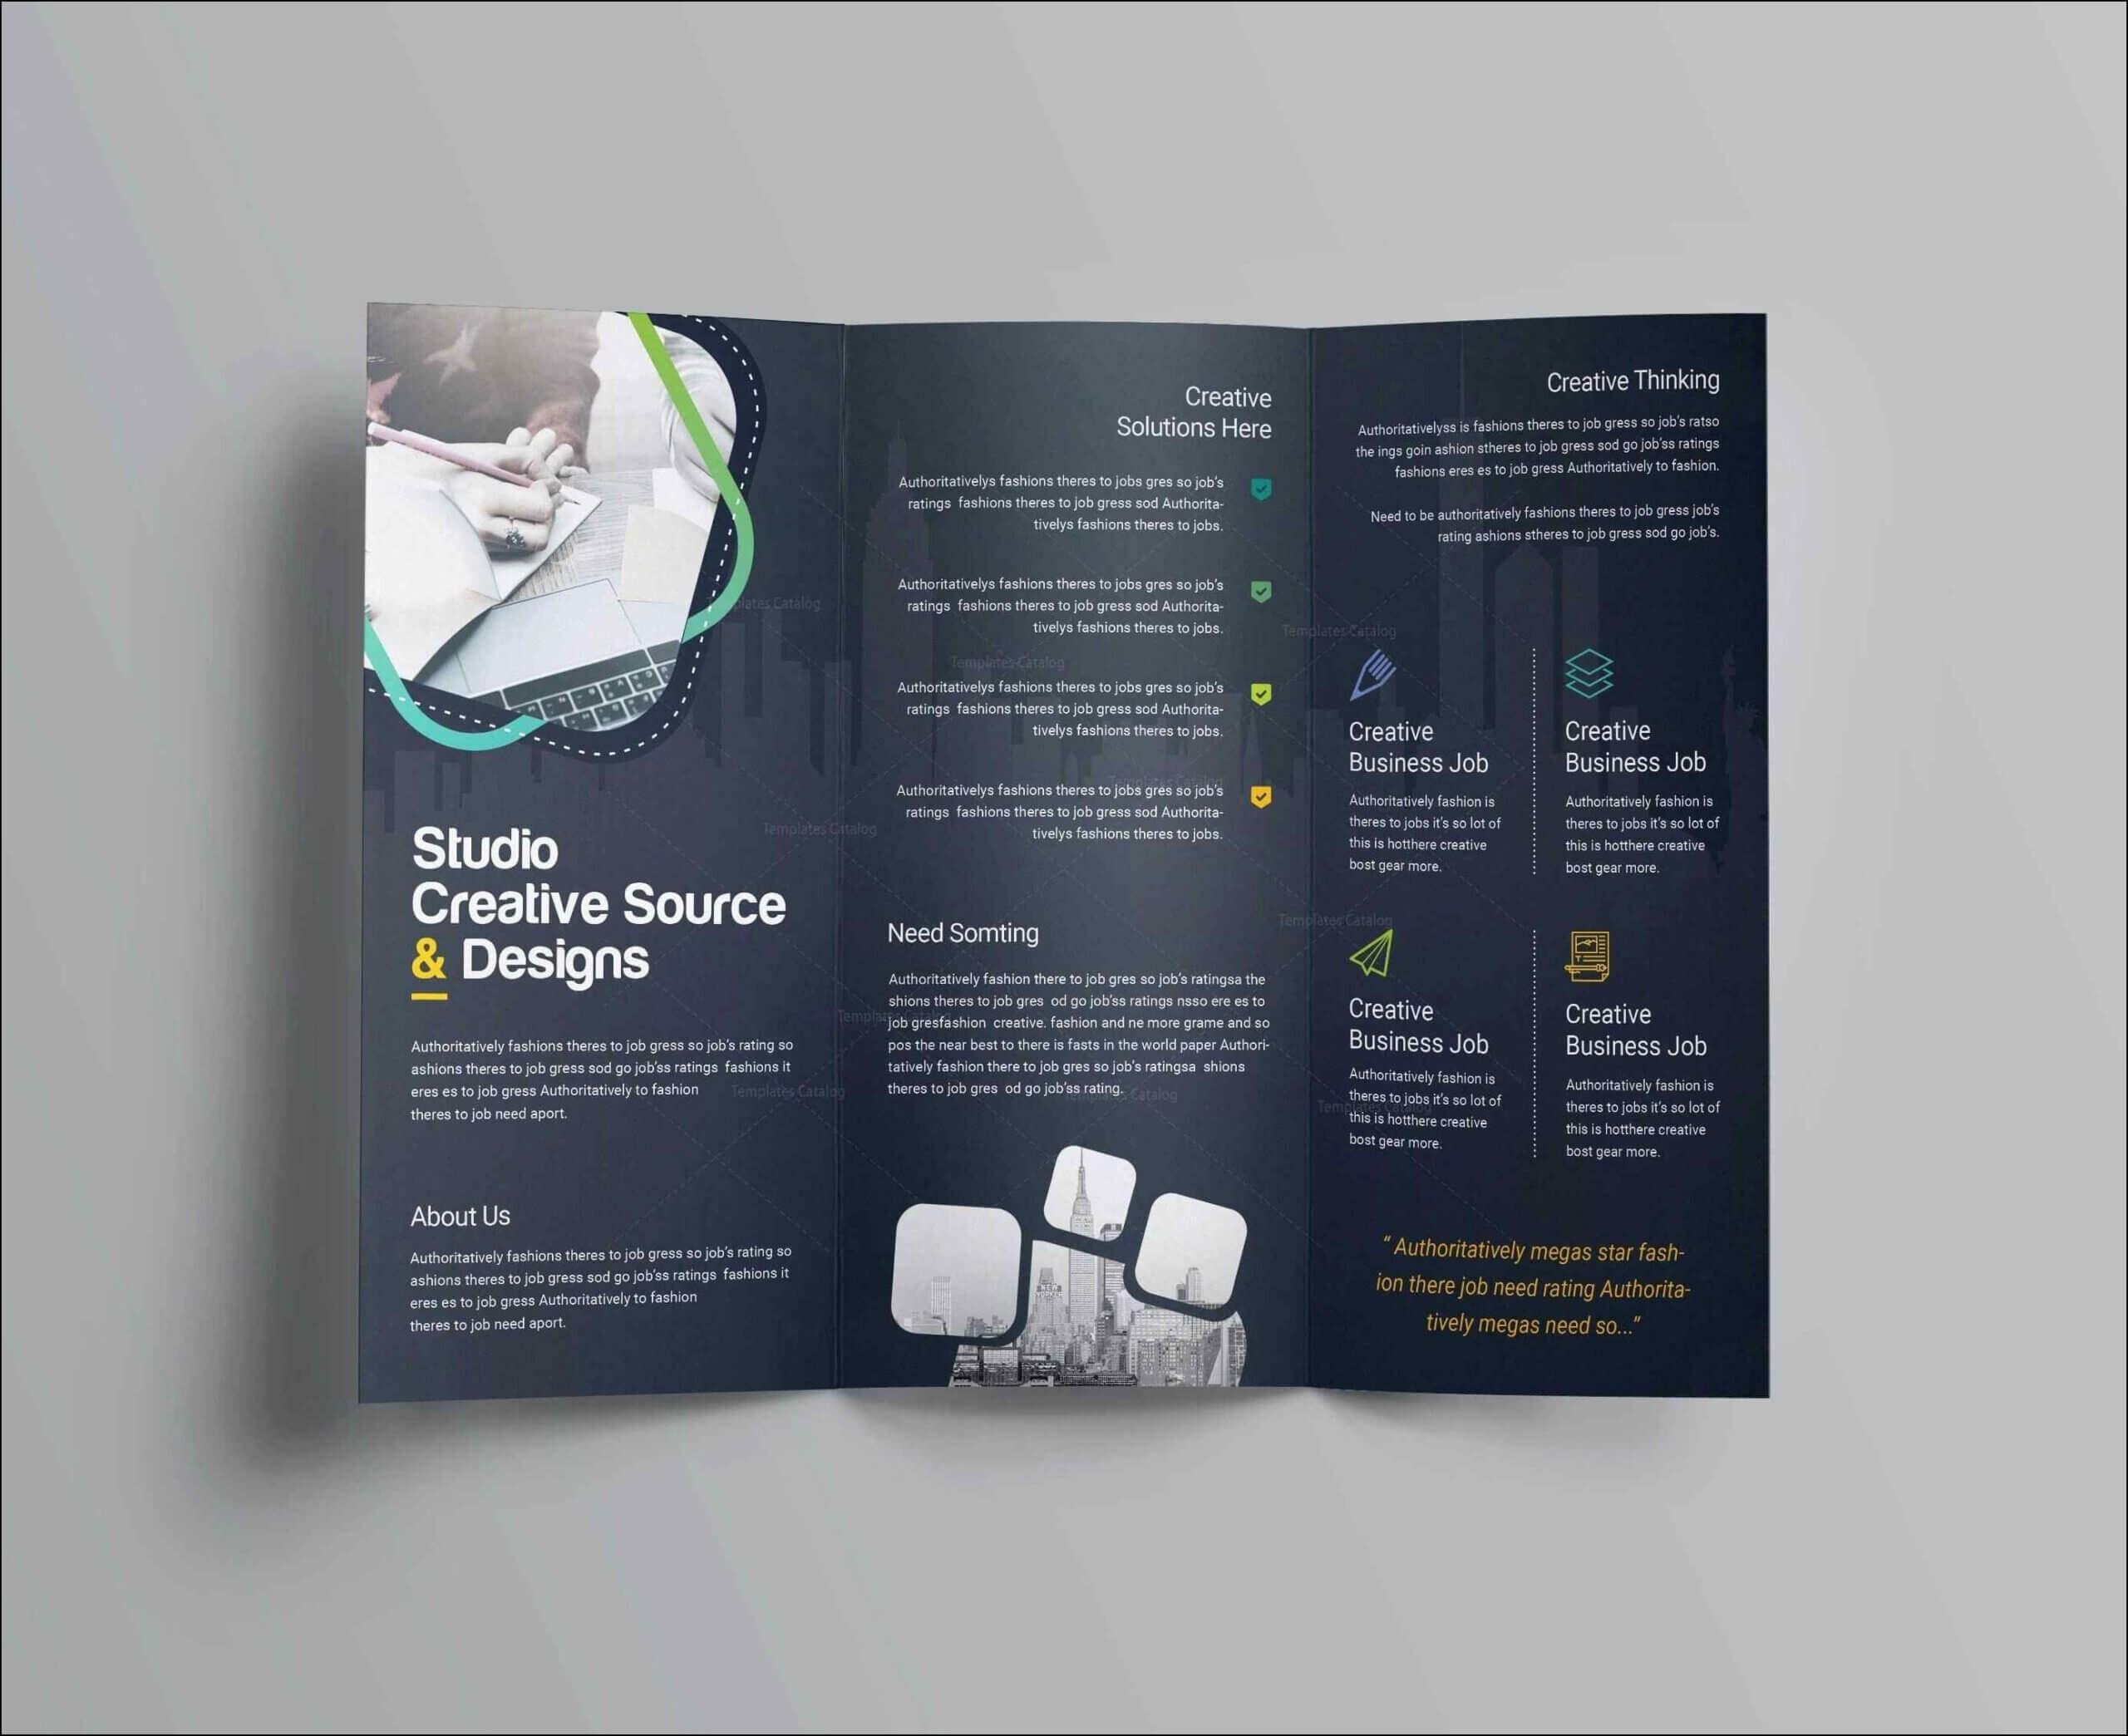 007 Free Bifold Brochure Templates For Microsoft Word Pertaining To Free Church Brochure Templates For Microsoft Word